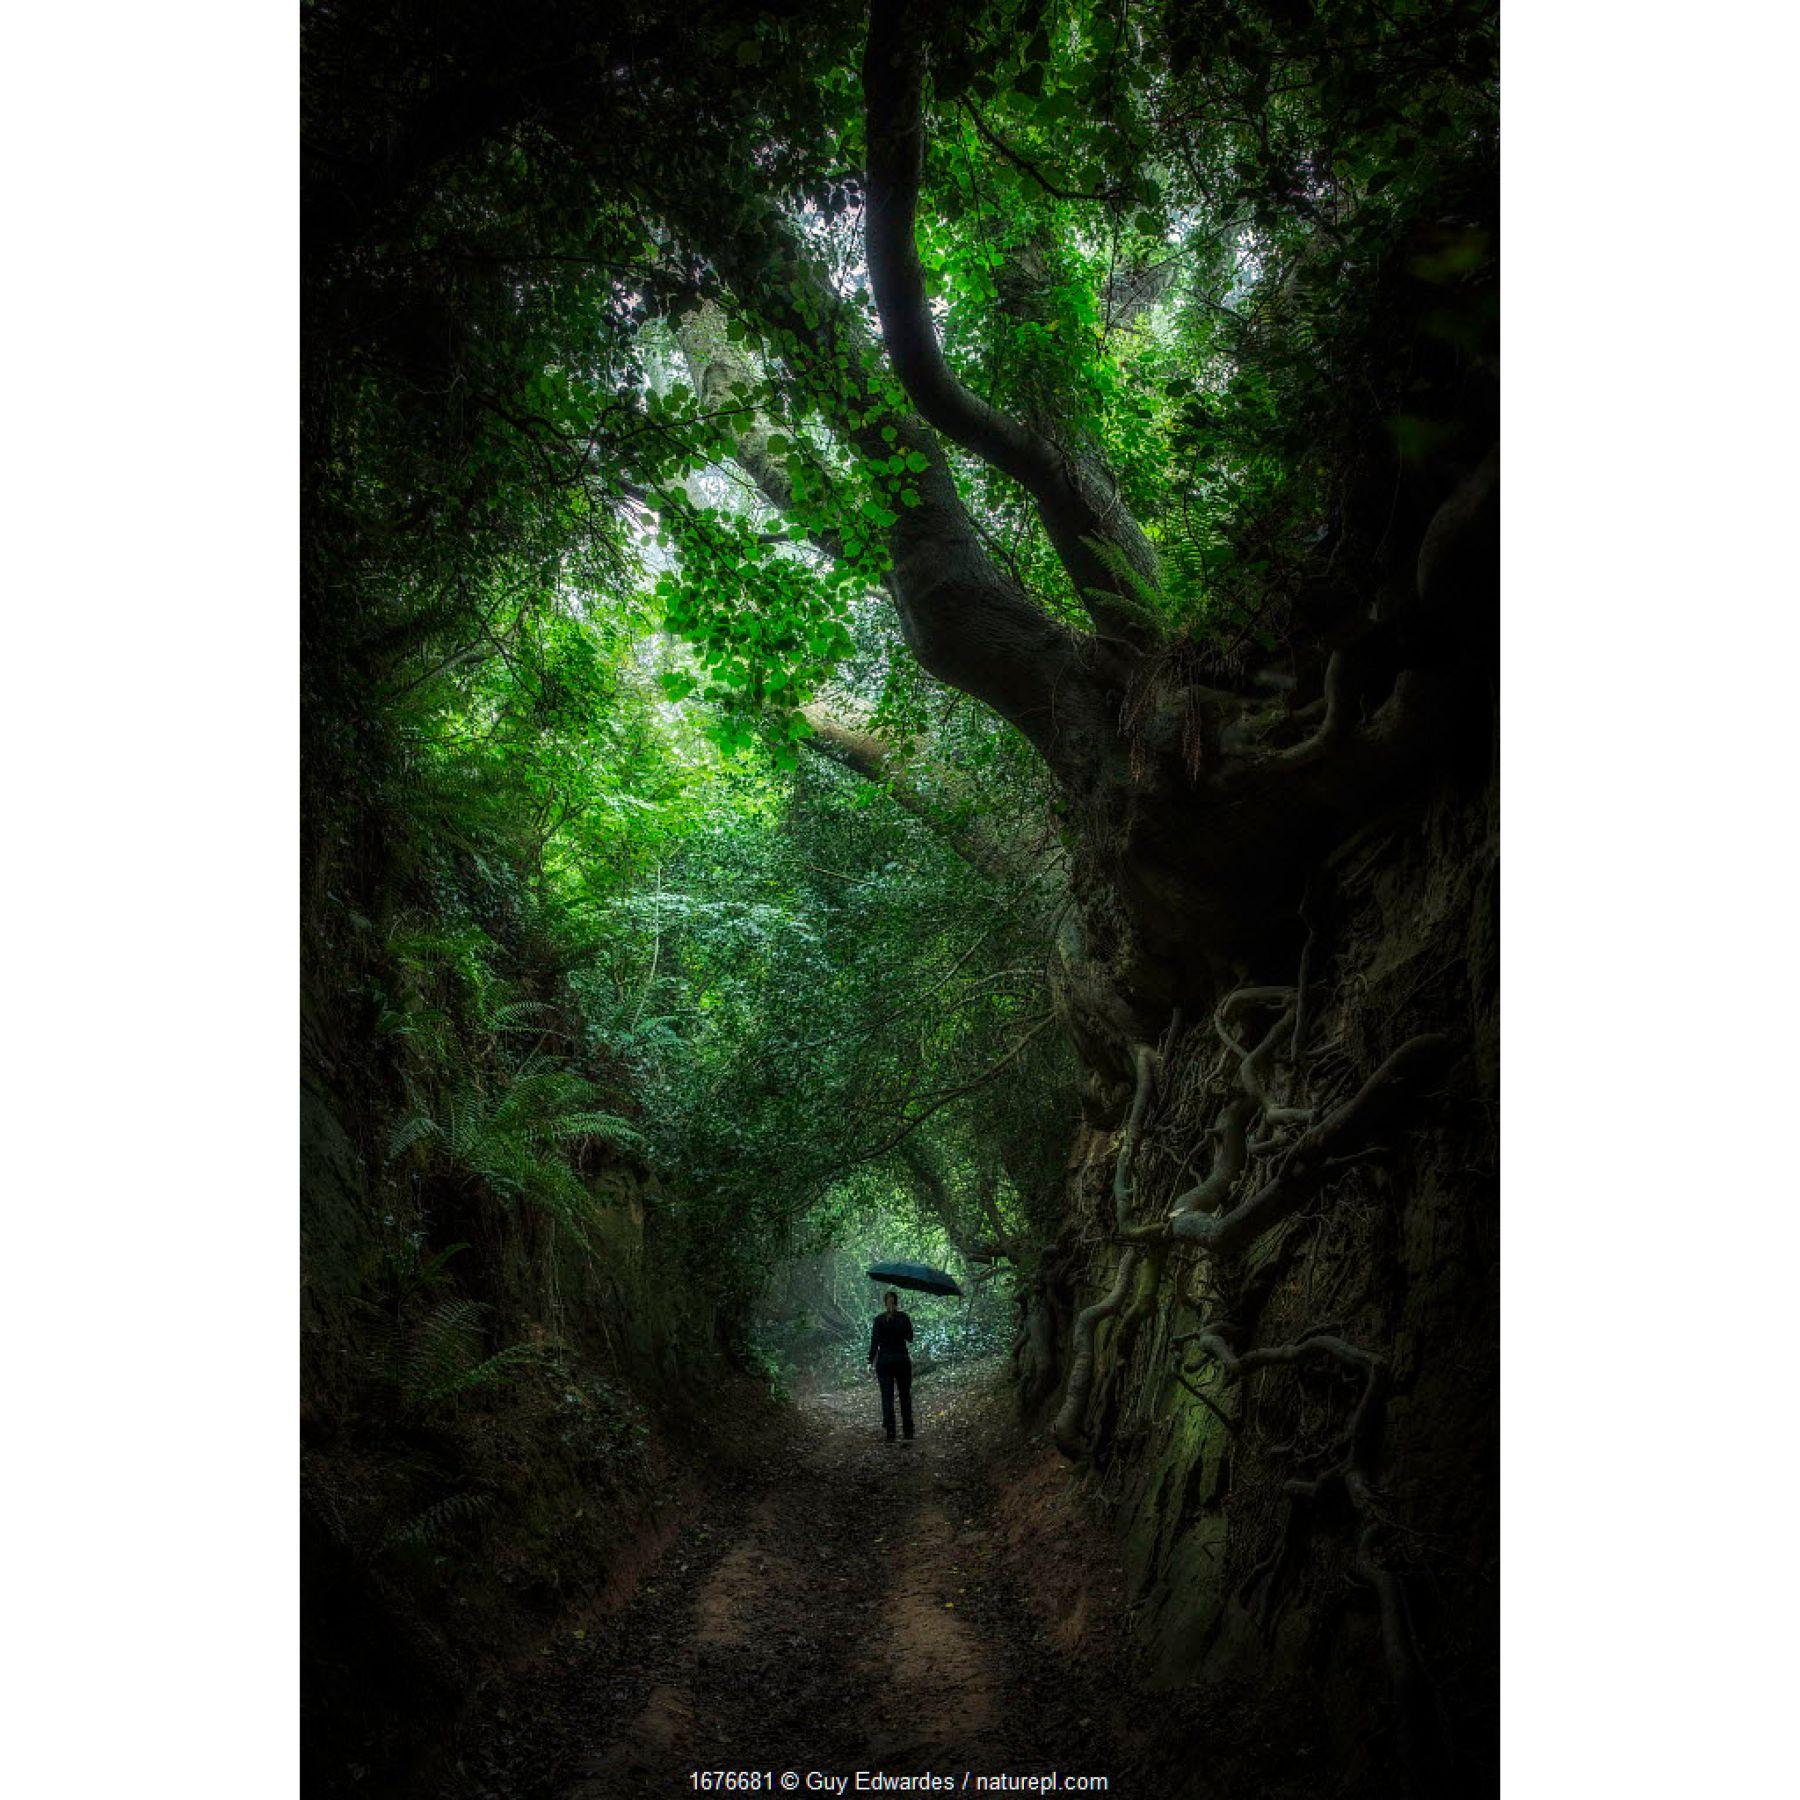 Person walking along Hell Lane, Sunken Lane (Holloway), Symondsbury, Bridport, Dorset, England, UK. August 2020